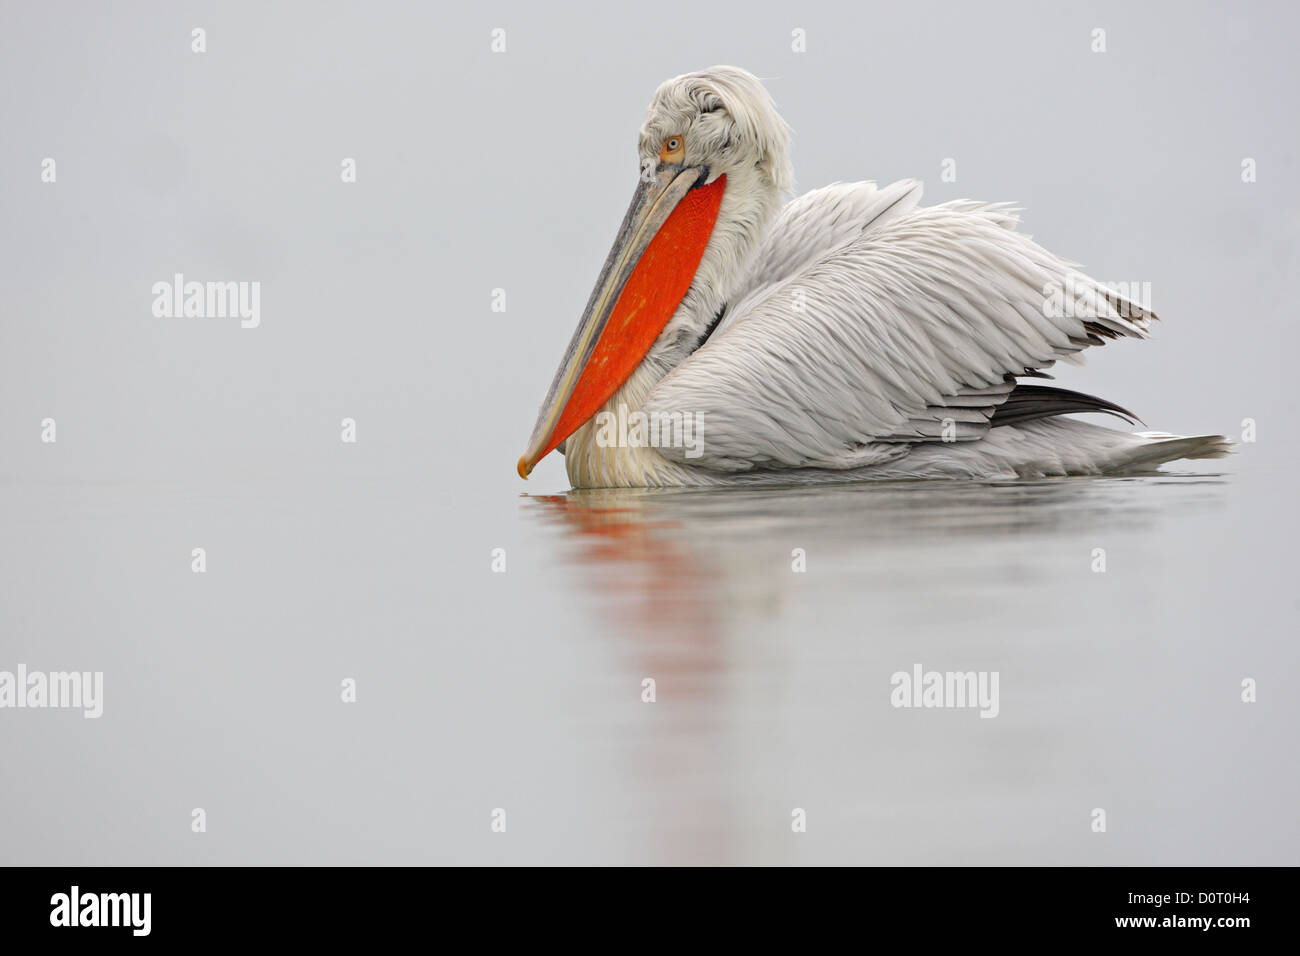 Dalmatian pelican, male, breeding plumage, Pelicanus crispus, Bulgaria - Stock Image